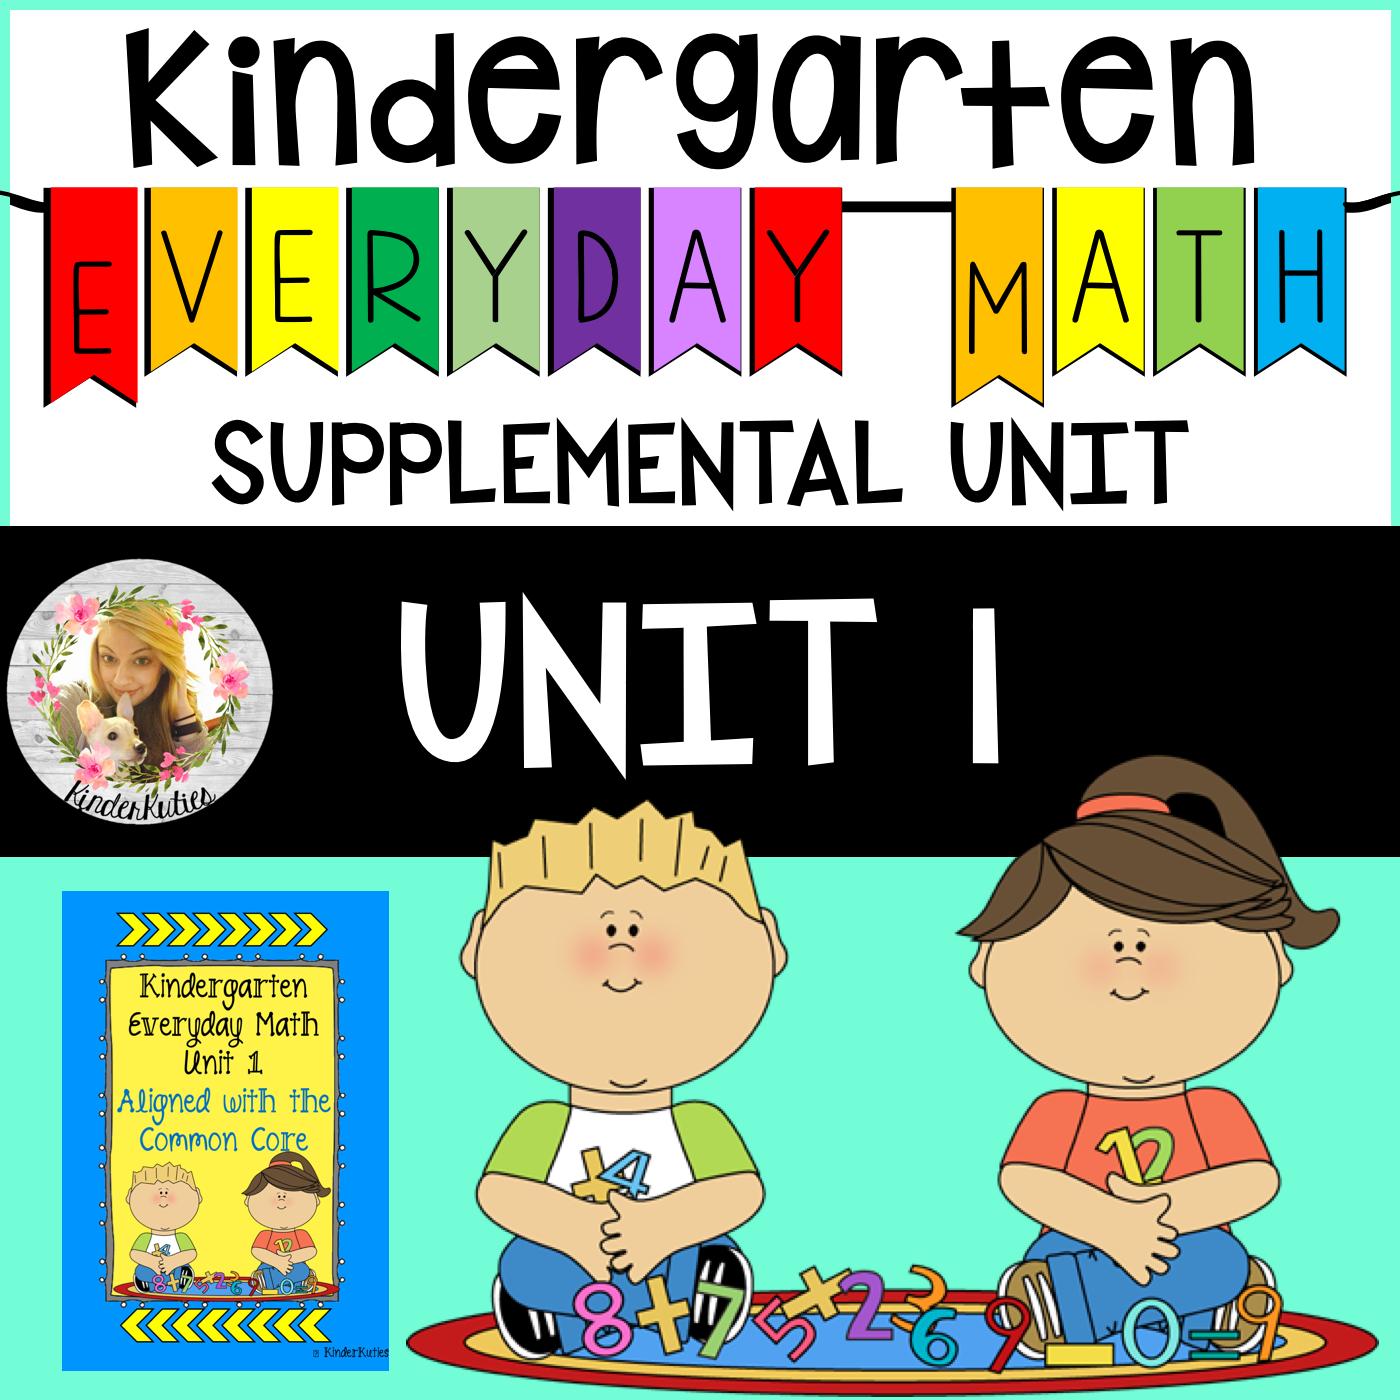 Kindergarten Everyday Math No Prep Supplemental Materials